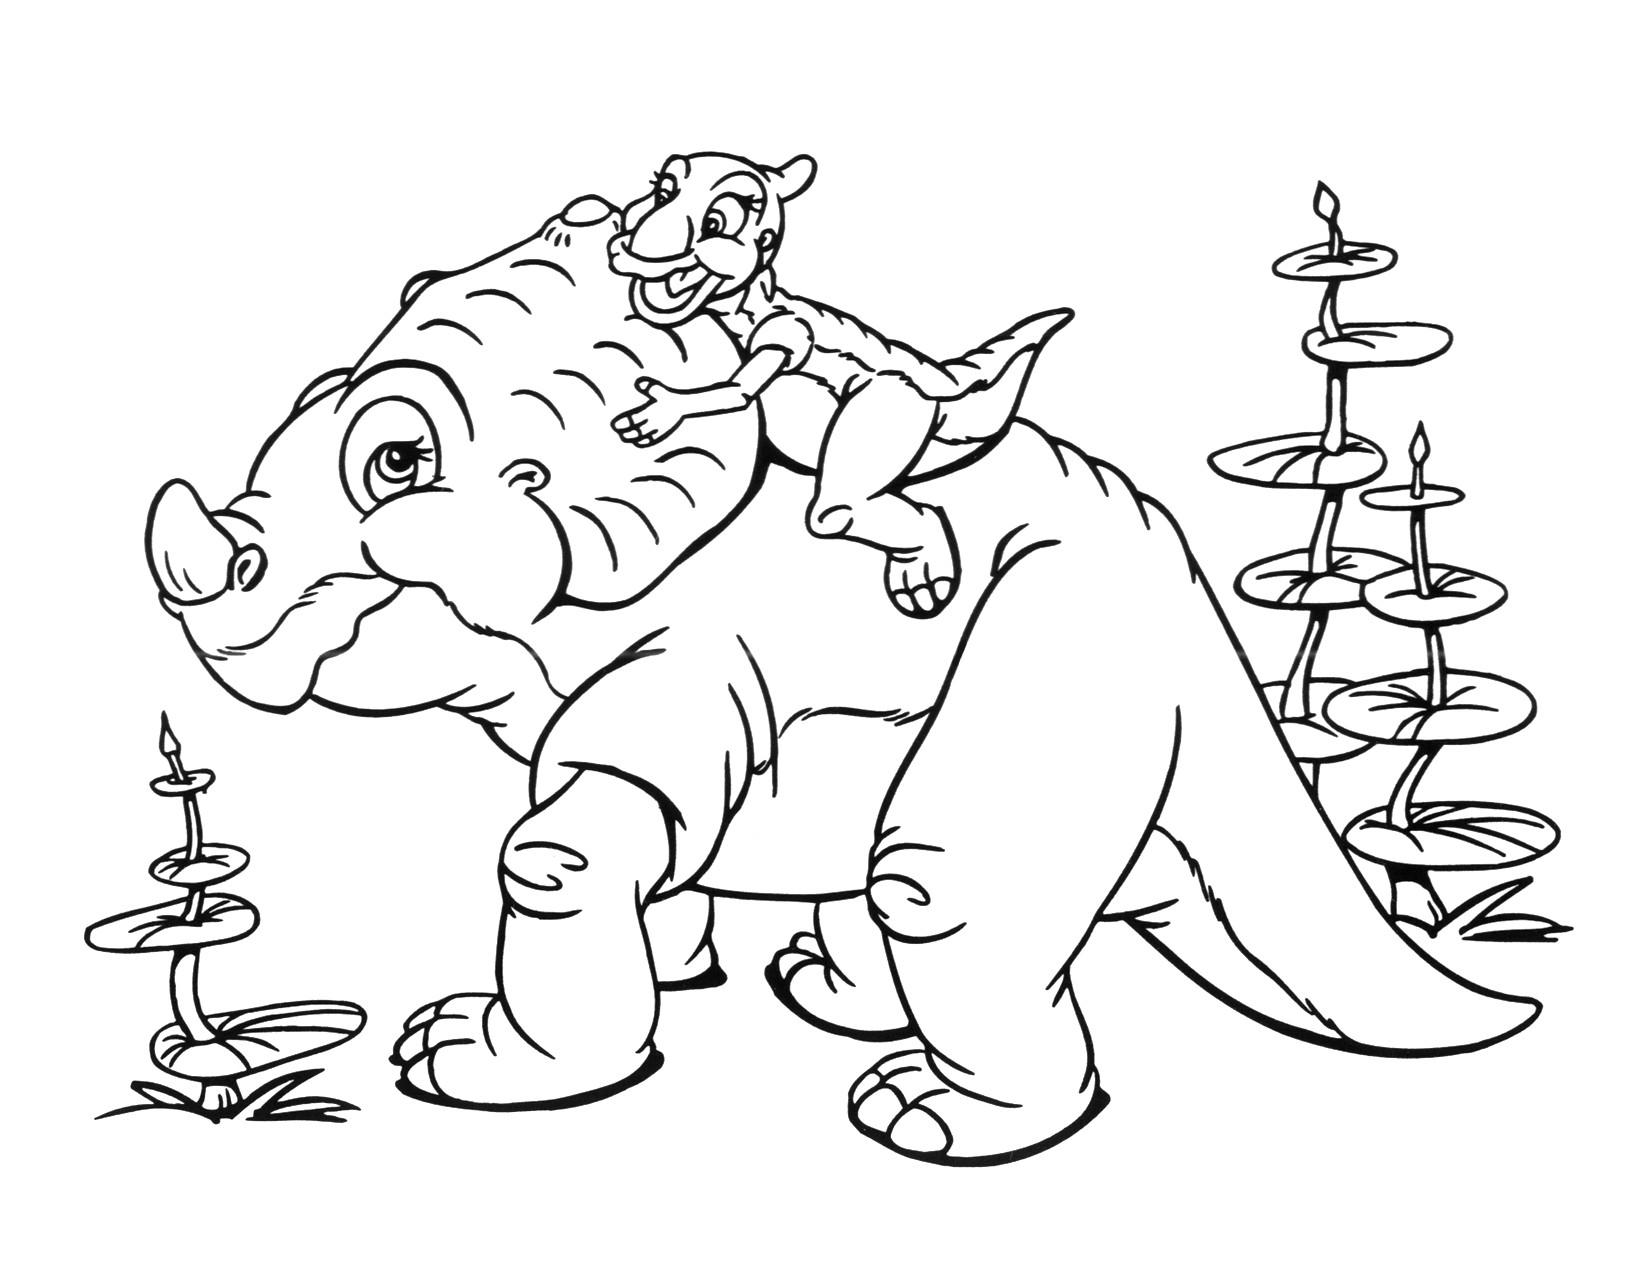 1650x1275 Tiffany Animal Crossing New Leaf Free Draw To Color